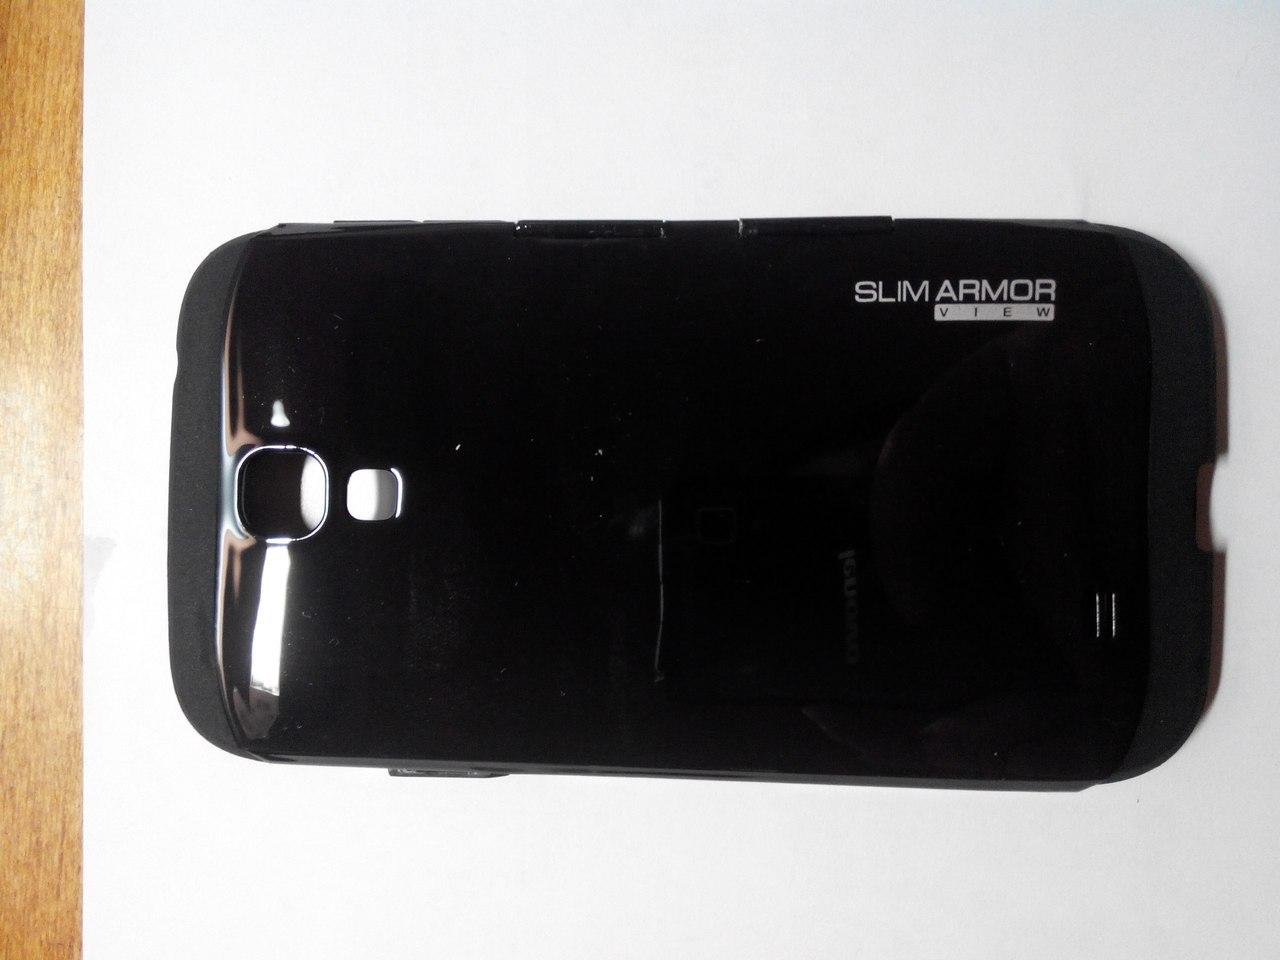 Aliexpress: Чехол-книжка/трансформер для Samsung Galaxy S4